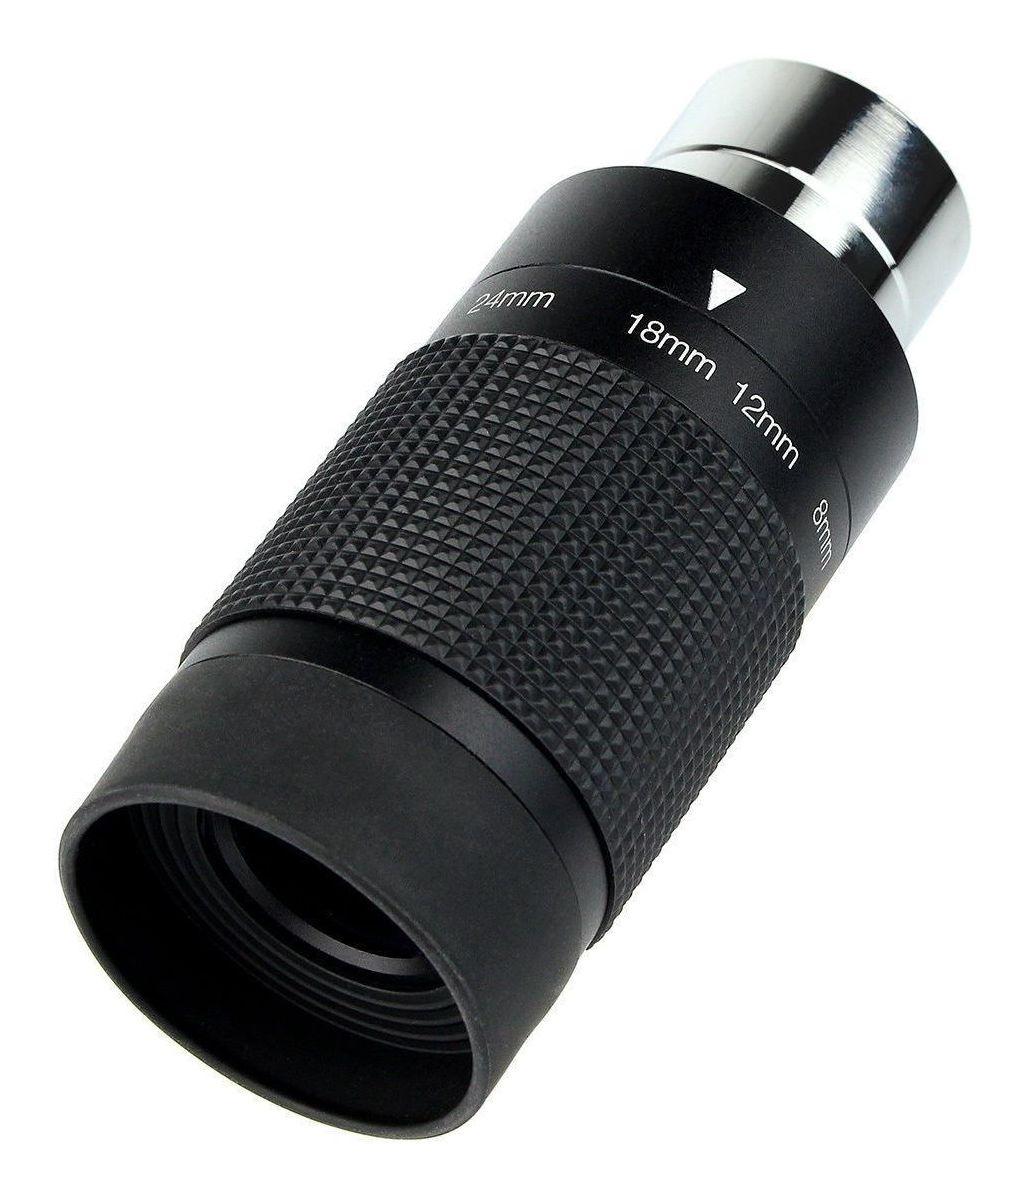 "Ocular Zoom 1,25"" de 8 a 24mm - Modelo #93230 - CELESTRON"